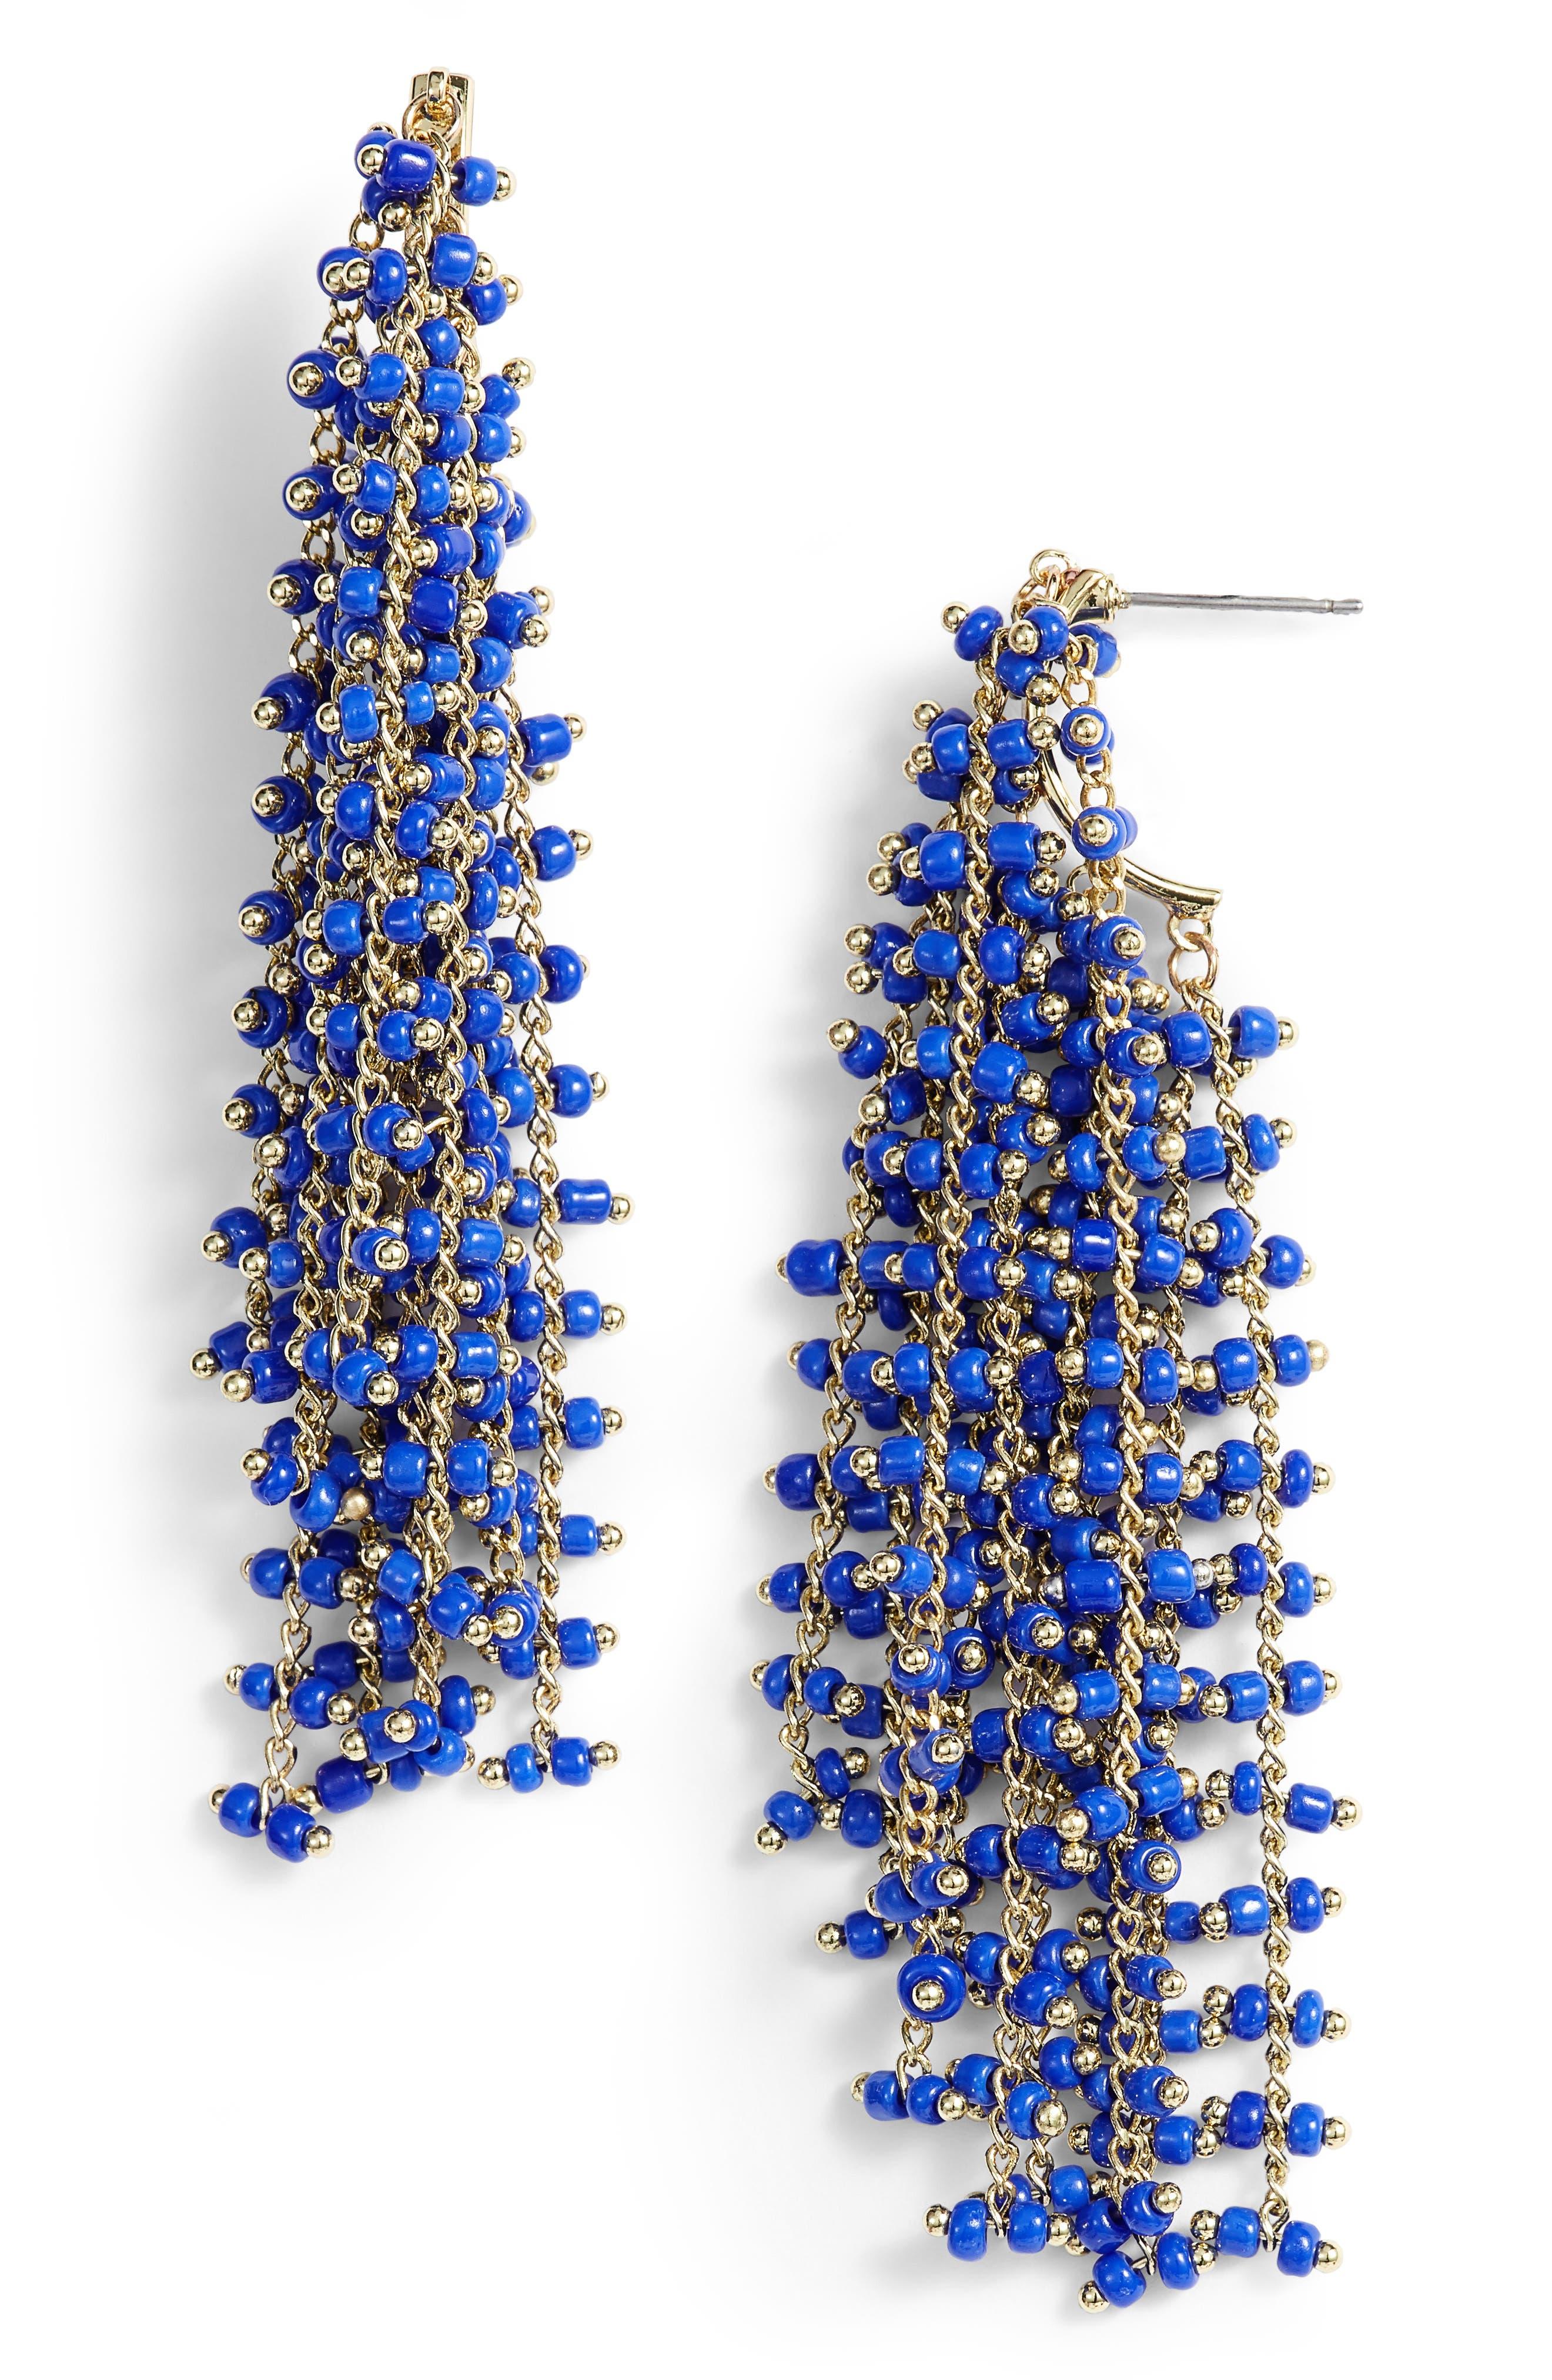 Beaded Fringe Earrings,                             Main thumbnail 1, color,                             Gold/ Blue